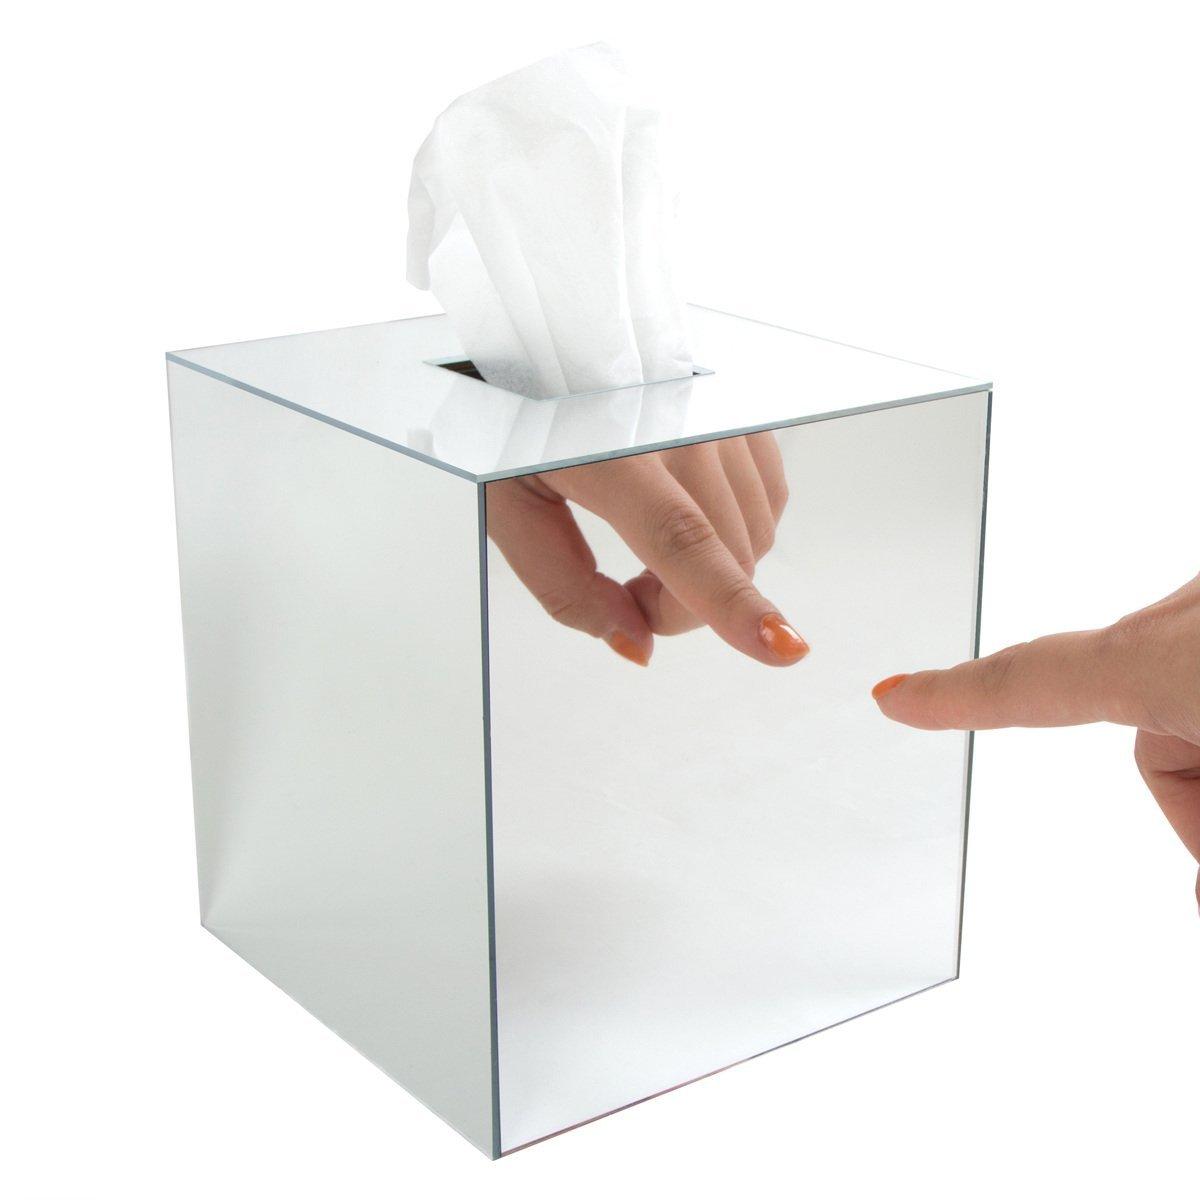 Amazon tissue 10 คีย์สินค้า ปี 2017 - อัพเดทข้อมูลสินค้าก่อนใครในประเทศไทย!